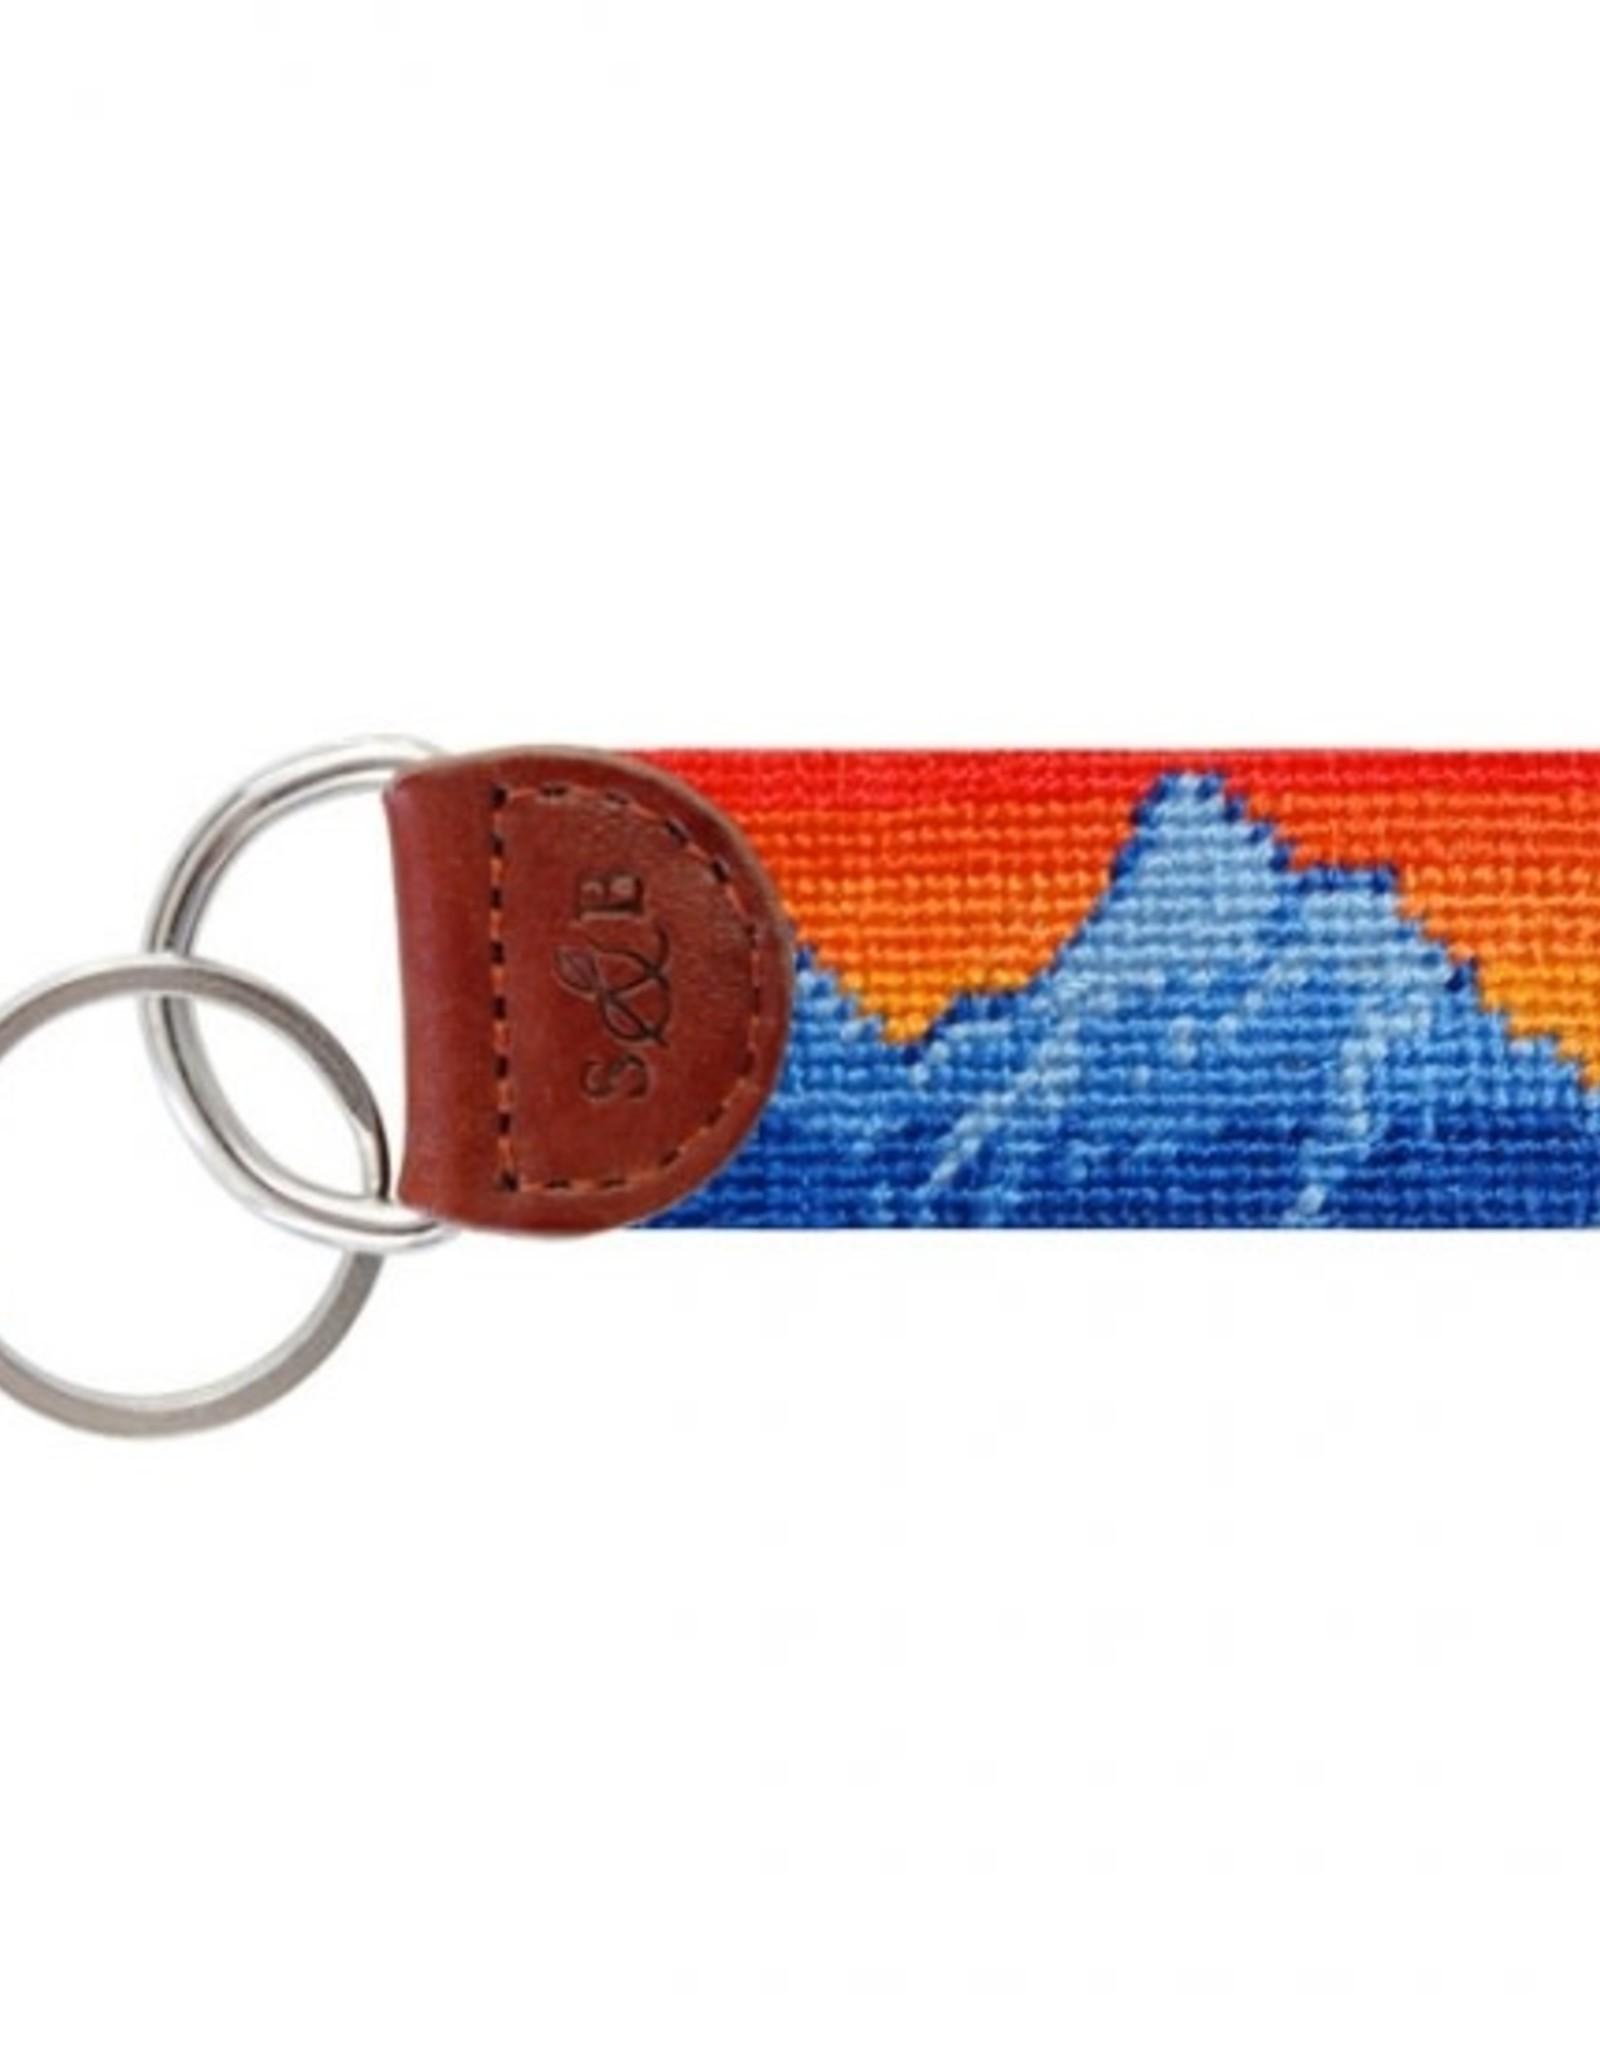 Smathers & Branson Mountain Sunset Needlepoint Key Fob